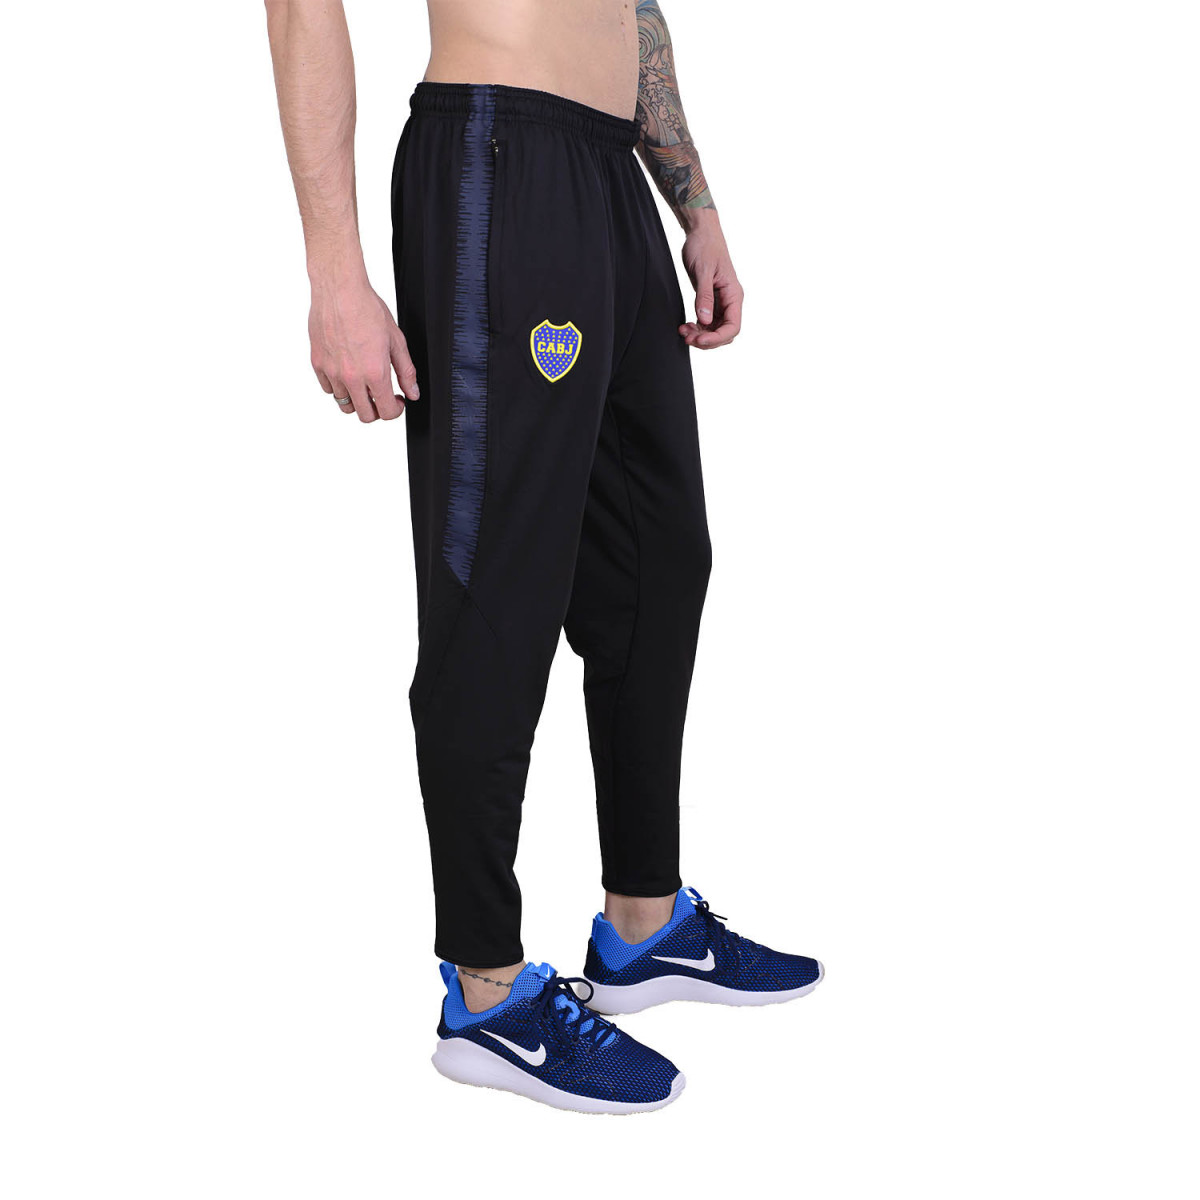 Pantalón Dry 2018 Boca Pantalones Indumentaria Calzas Nike AAqw7r